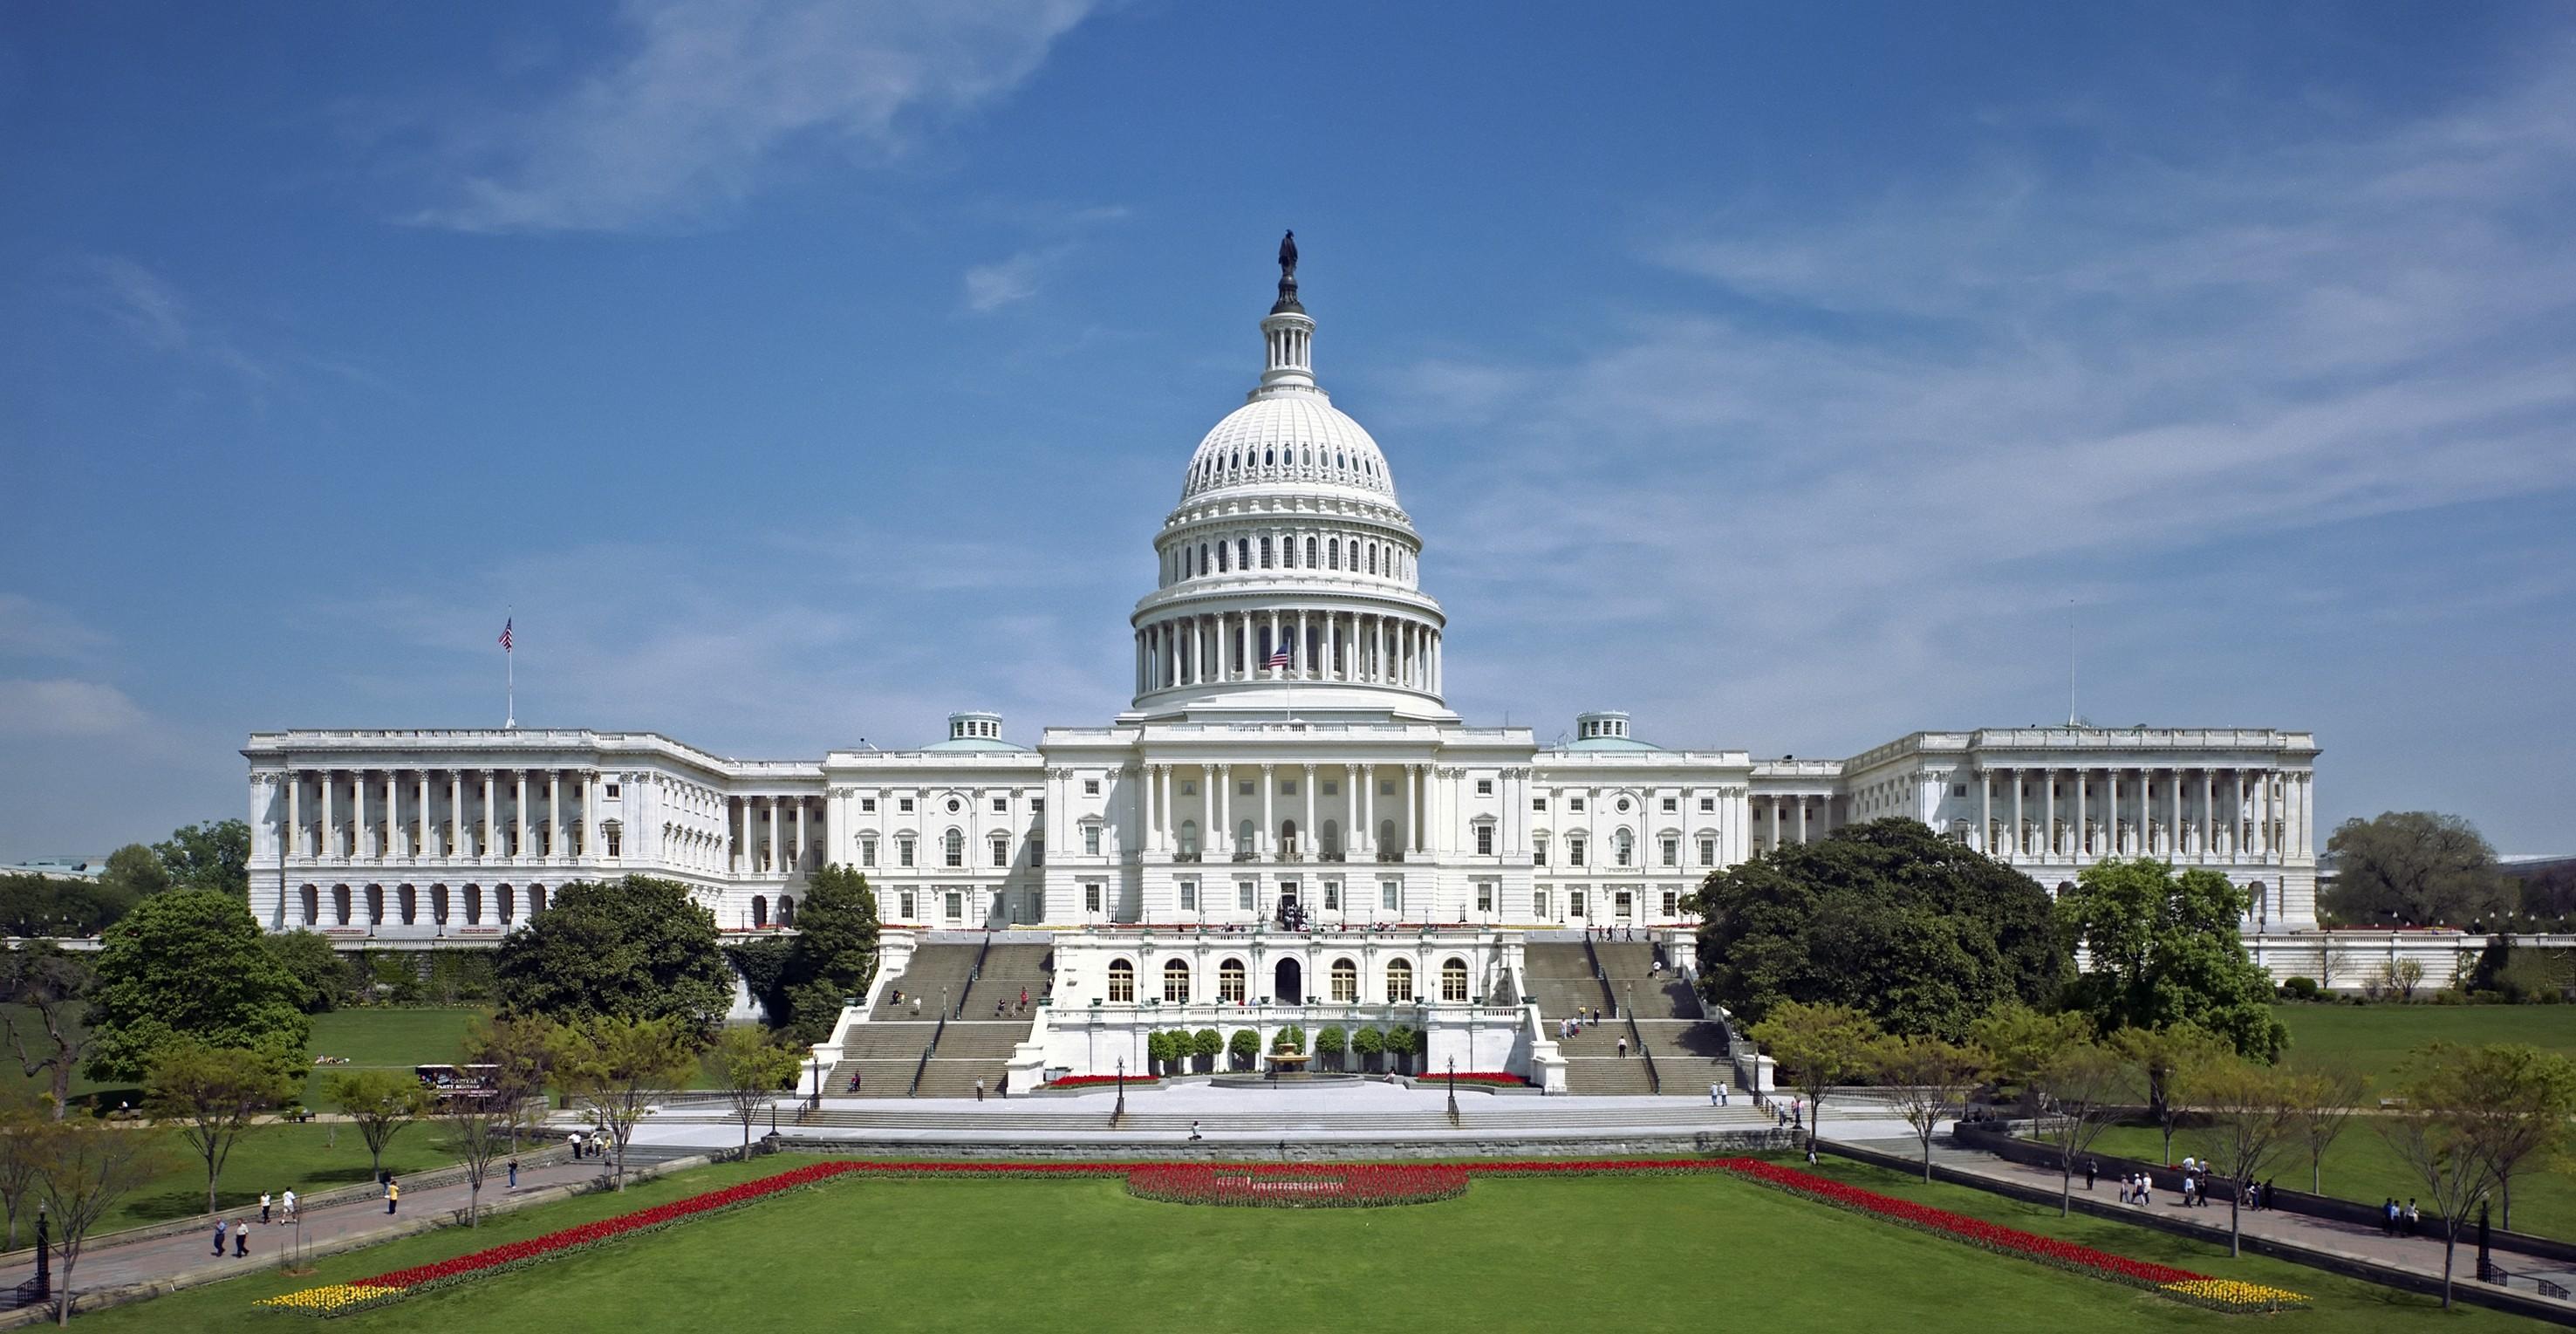 US Capital building on a sunny day